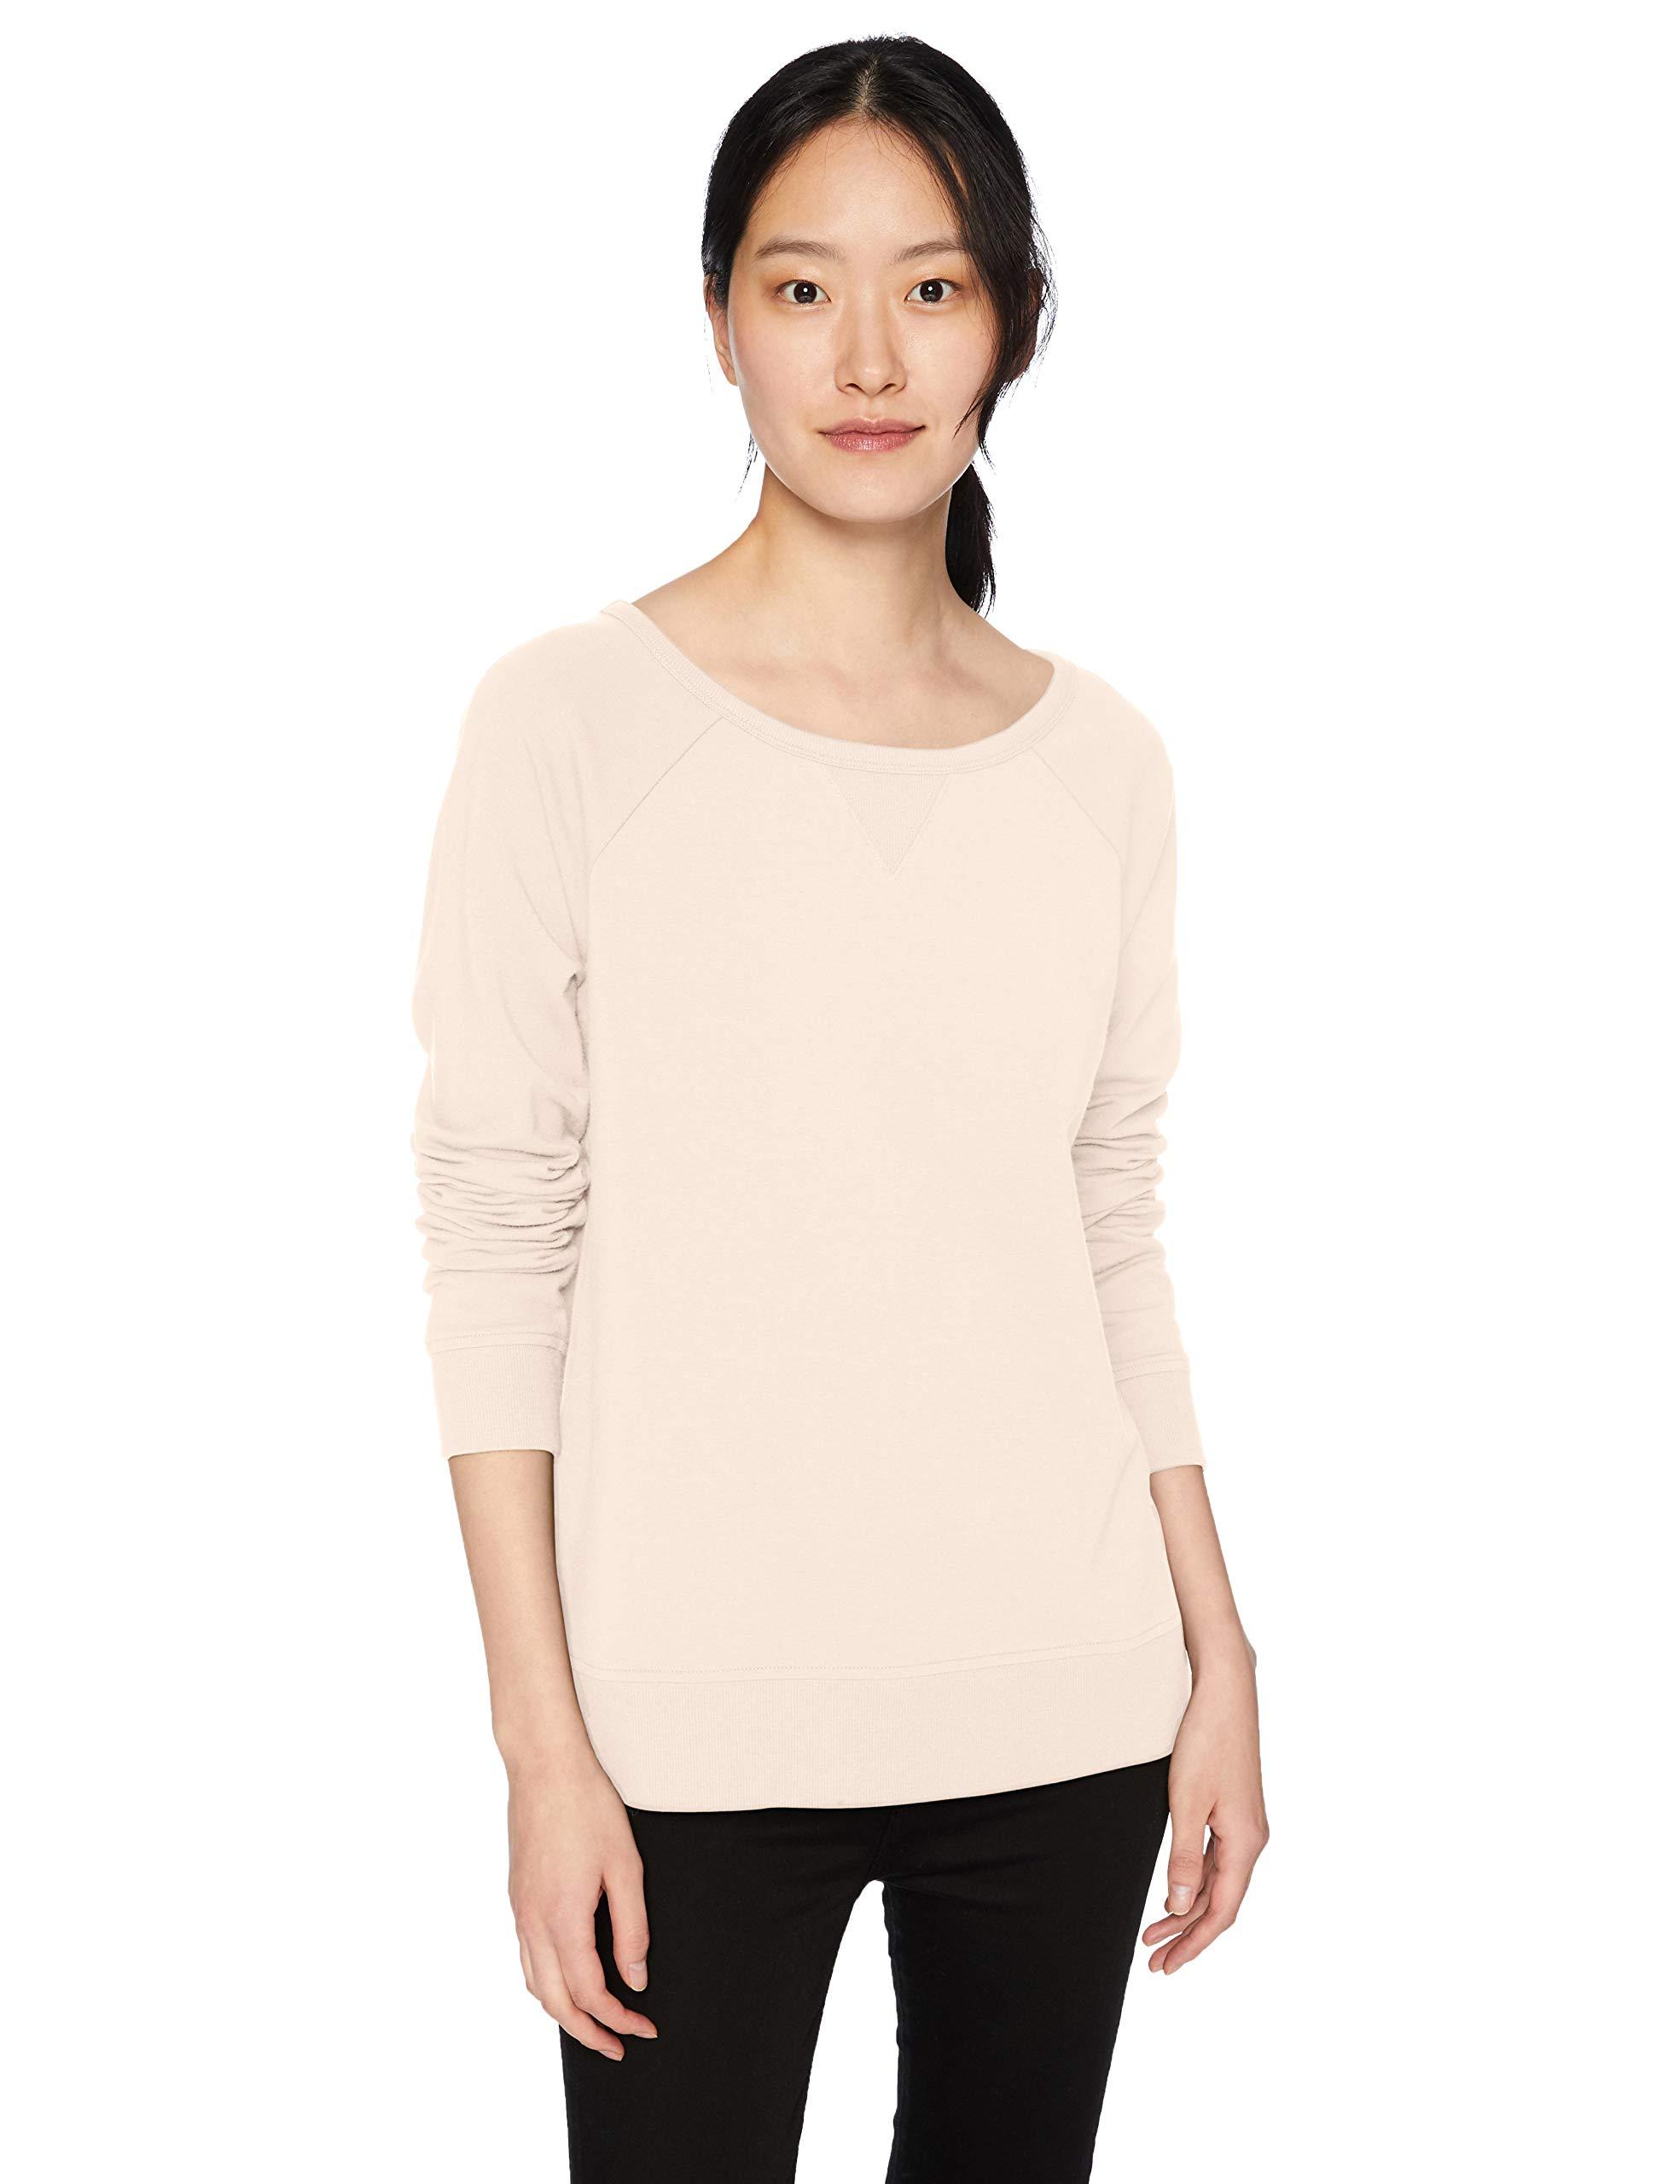 Amazon Brand - Daily Ritual Women's Terry Cotton and Modal High-Low Sweatshirt